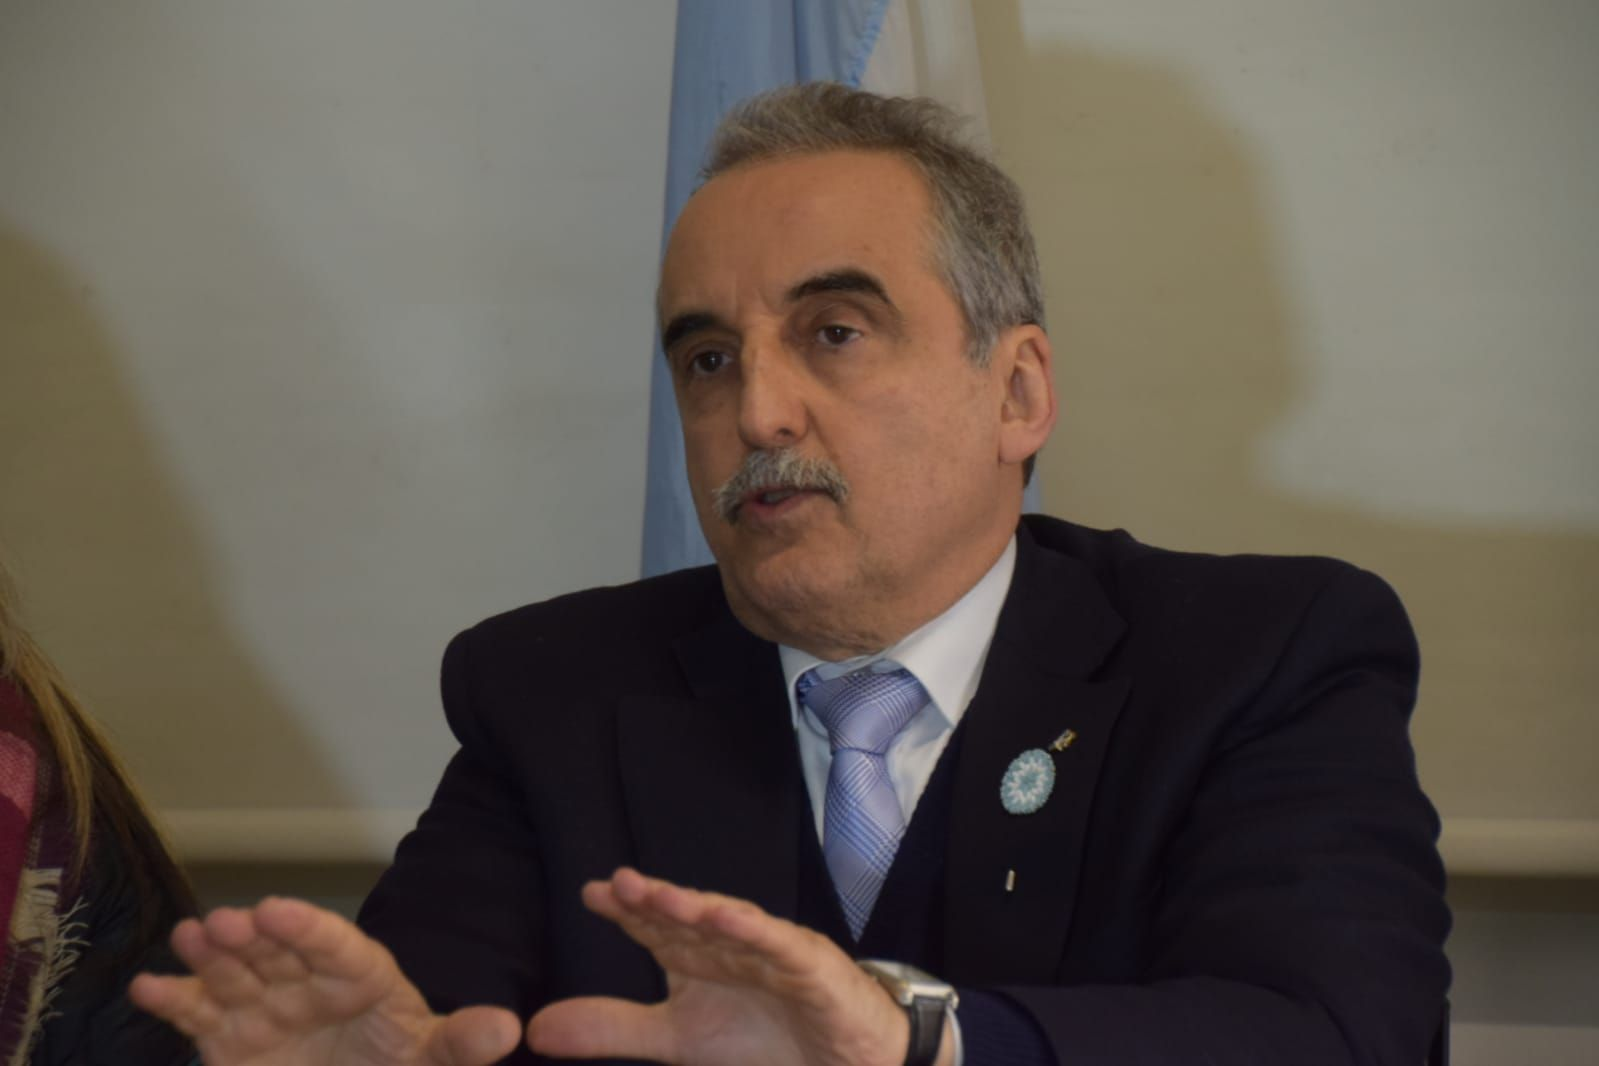 Guillermo Moreno recorrióOlavarría como candidato a diputado nacional por el Partido Republicano Federal